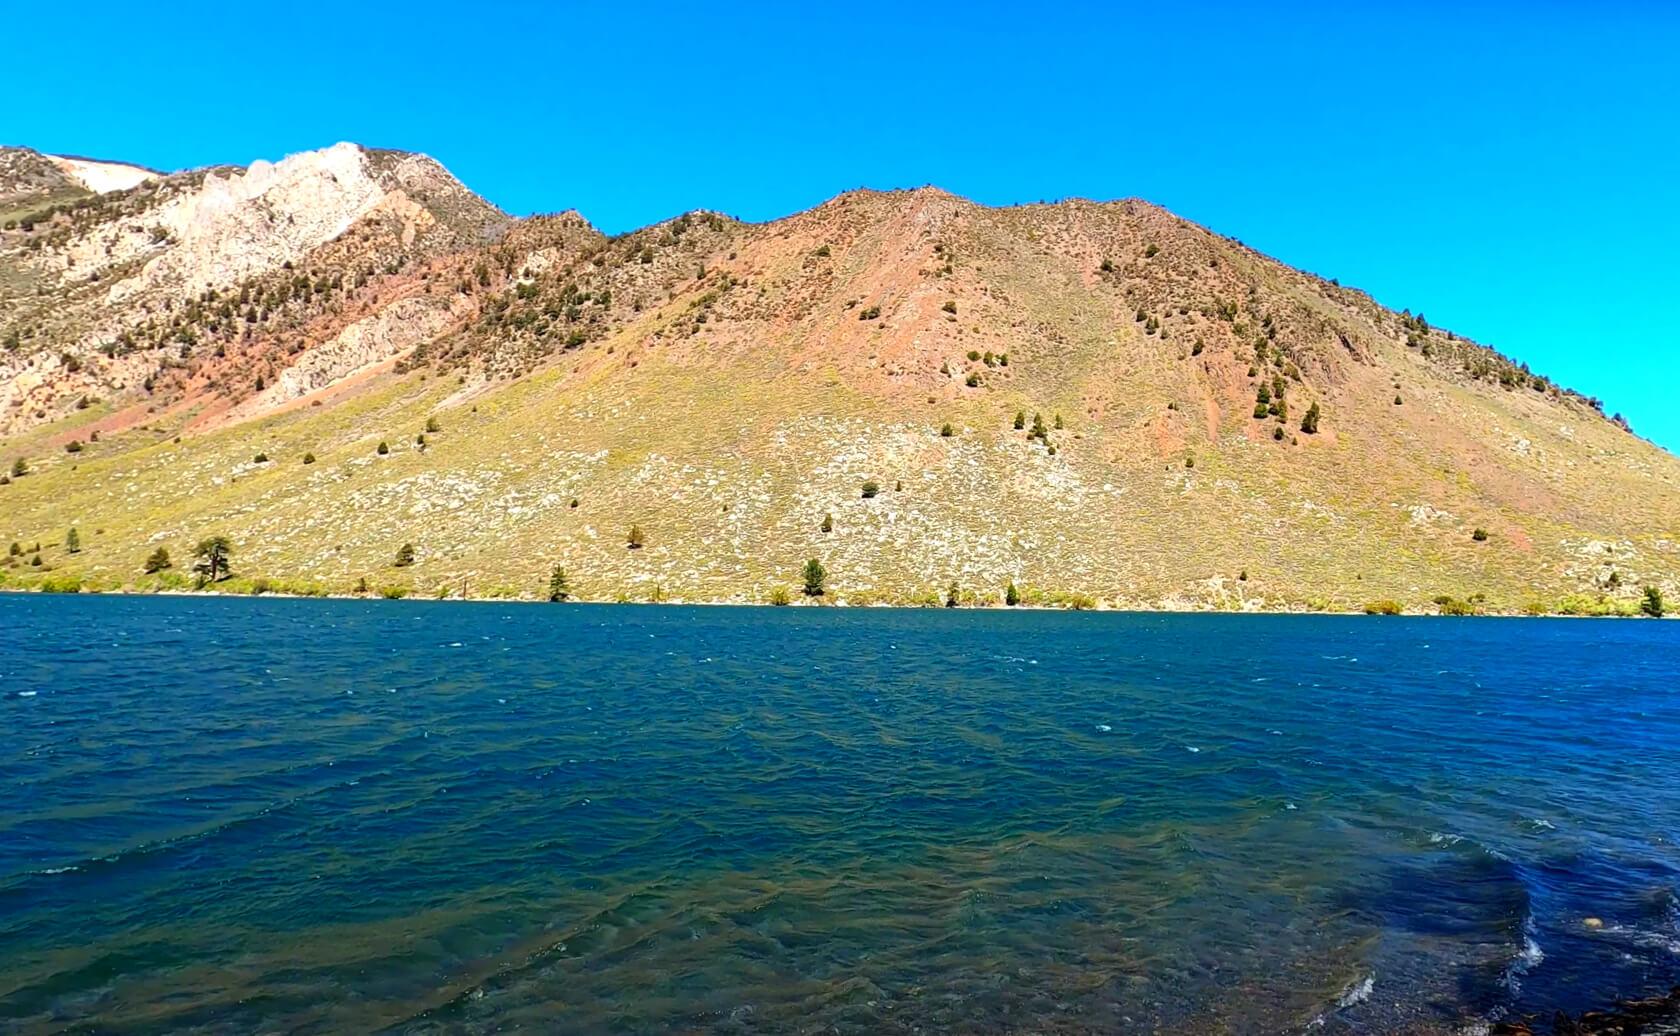 Convict-Lake-Reservoir-Fishing-Guide-Report-California-01